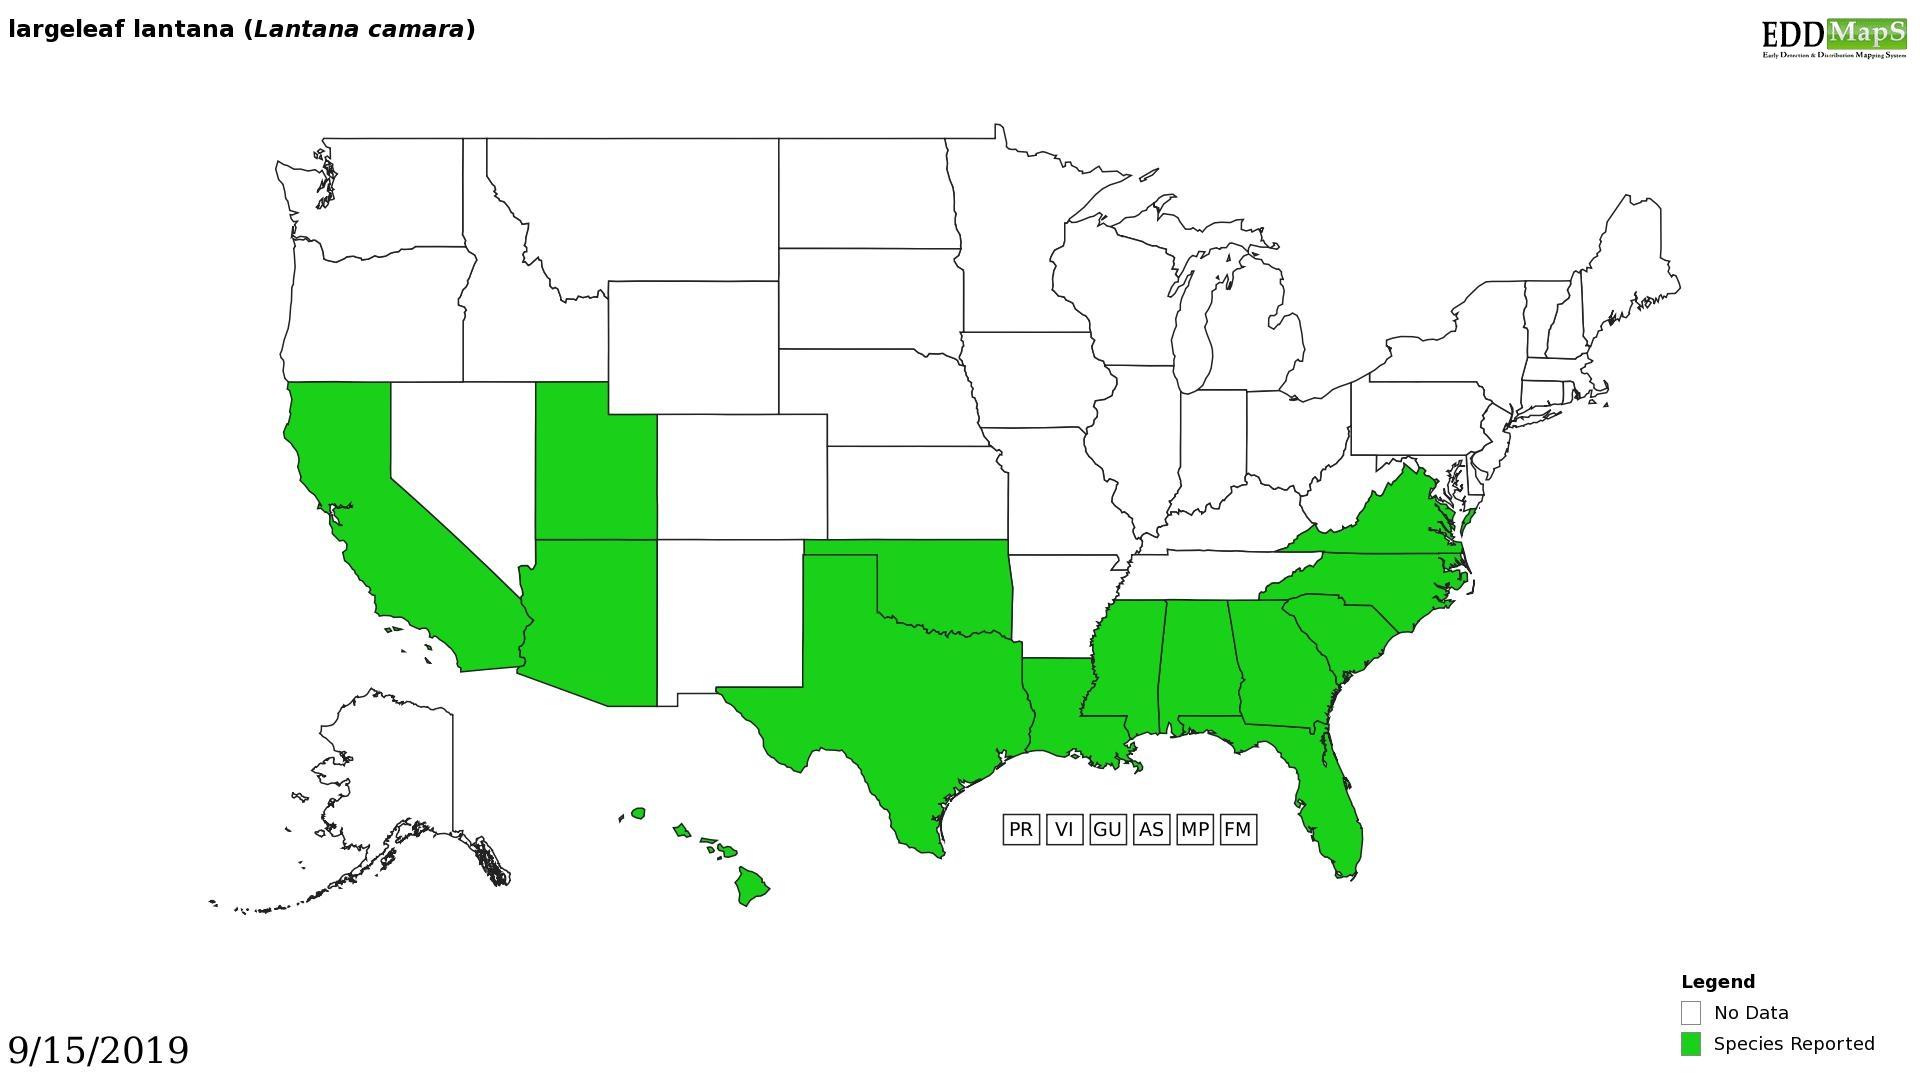 Lantana distribution - United States